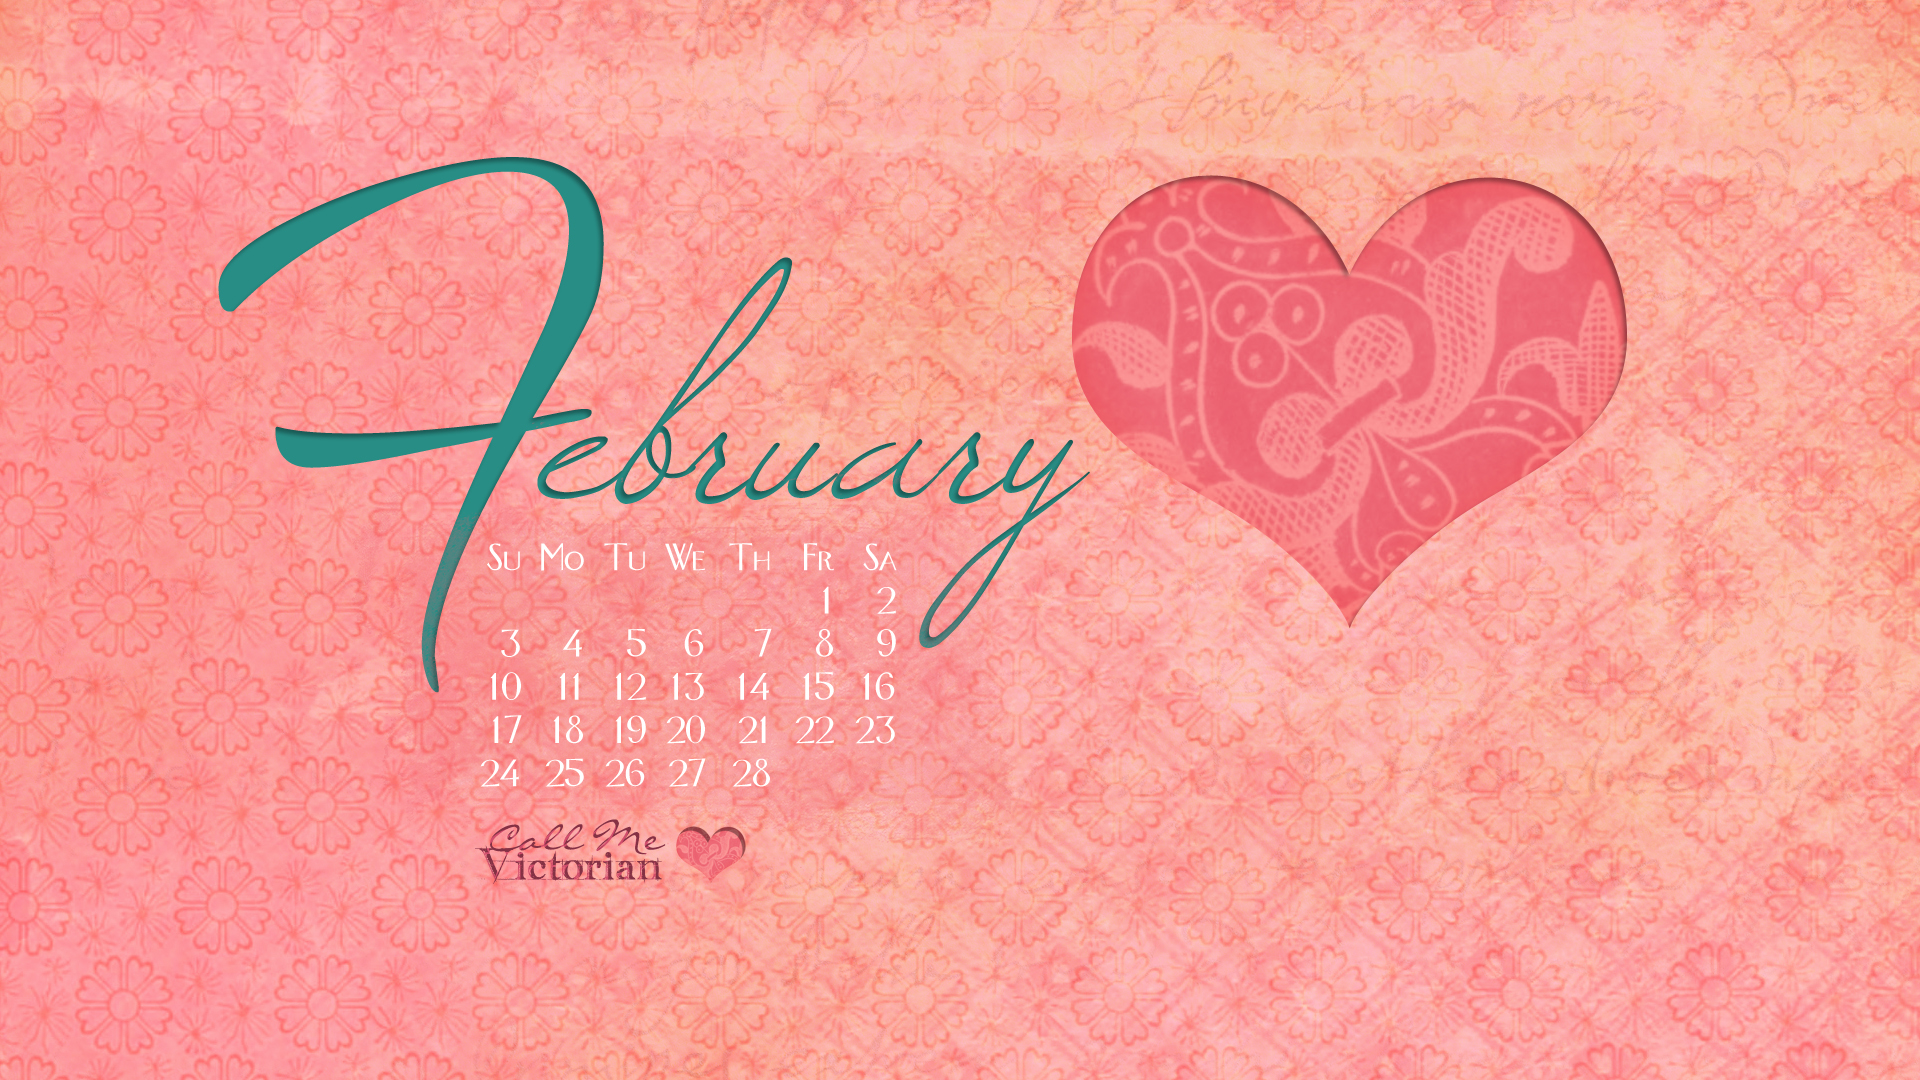 Wallpaper February February 2013 Desktop Calendar Wallpaper 1920x1080